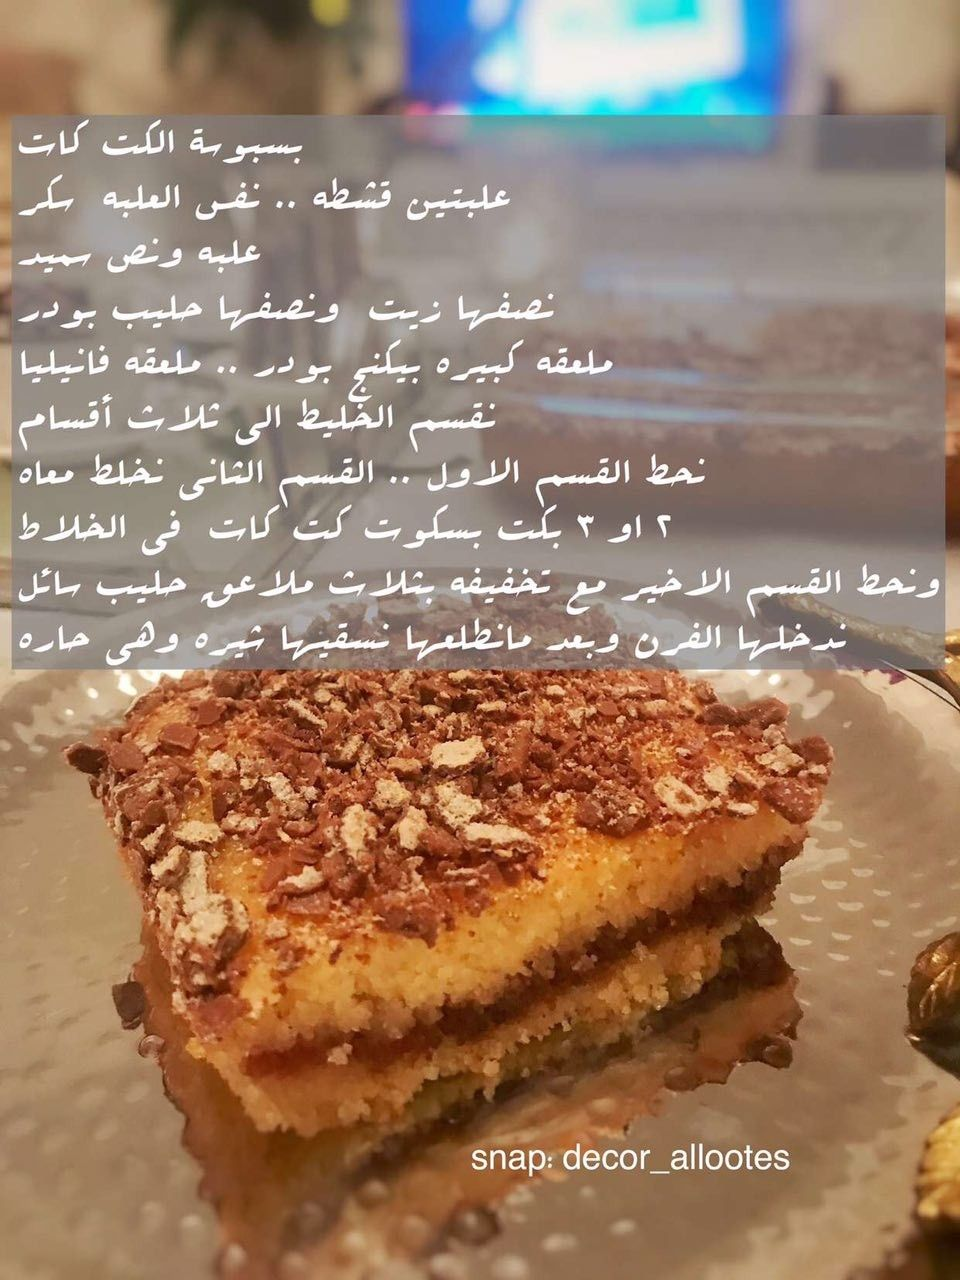 Pin By Zaaha 23 On لذاذه Finger Desserts Desserts Food